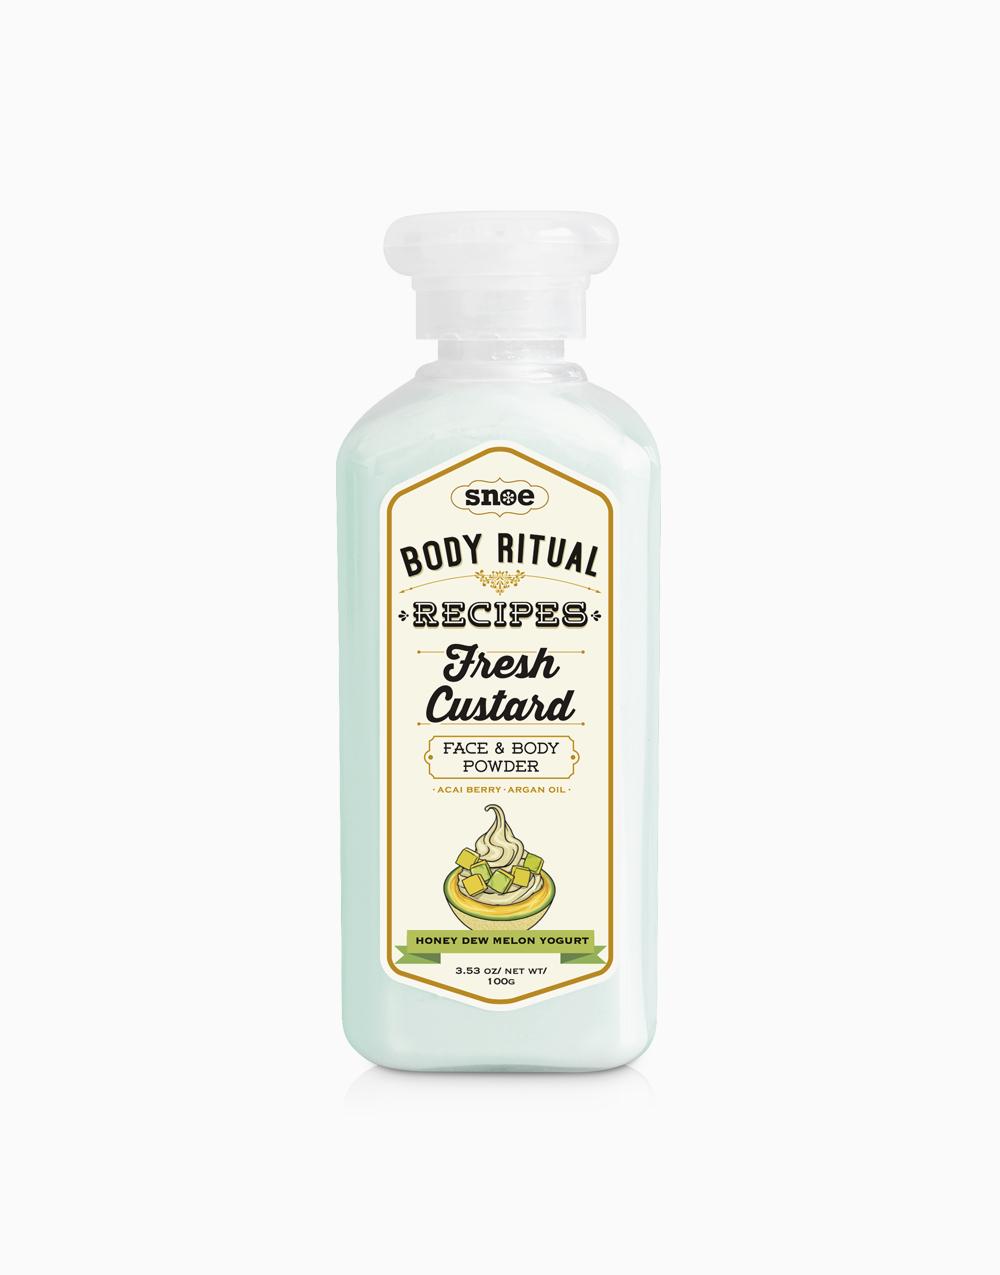 Body Ritual Recipes Fresh Custard Powder by Snoe Beauty   Honey Dew Melon Yogurt